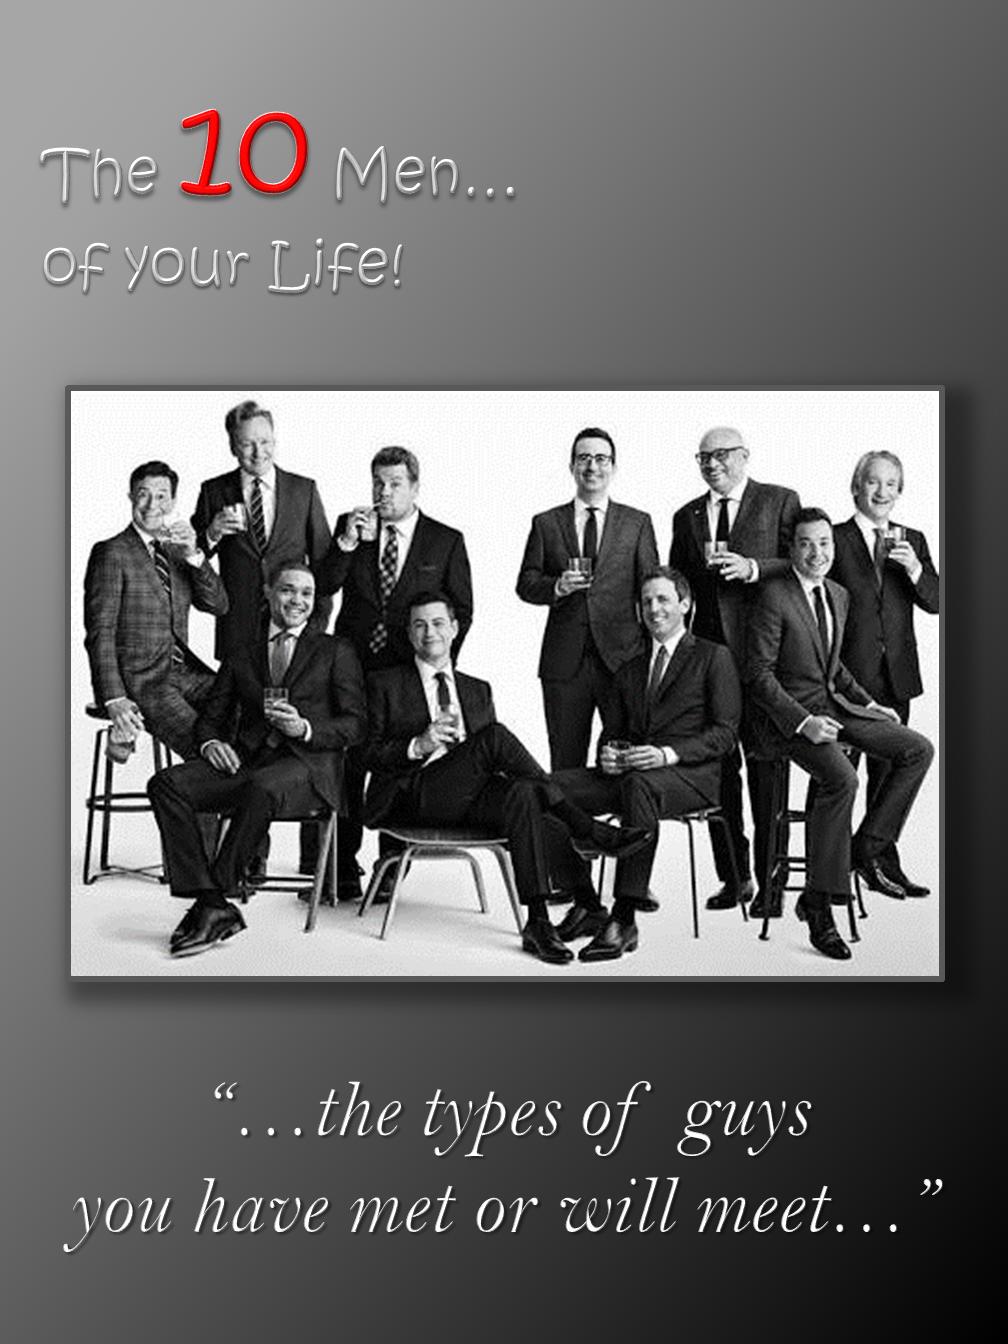 The 10 Men!